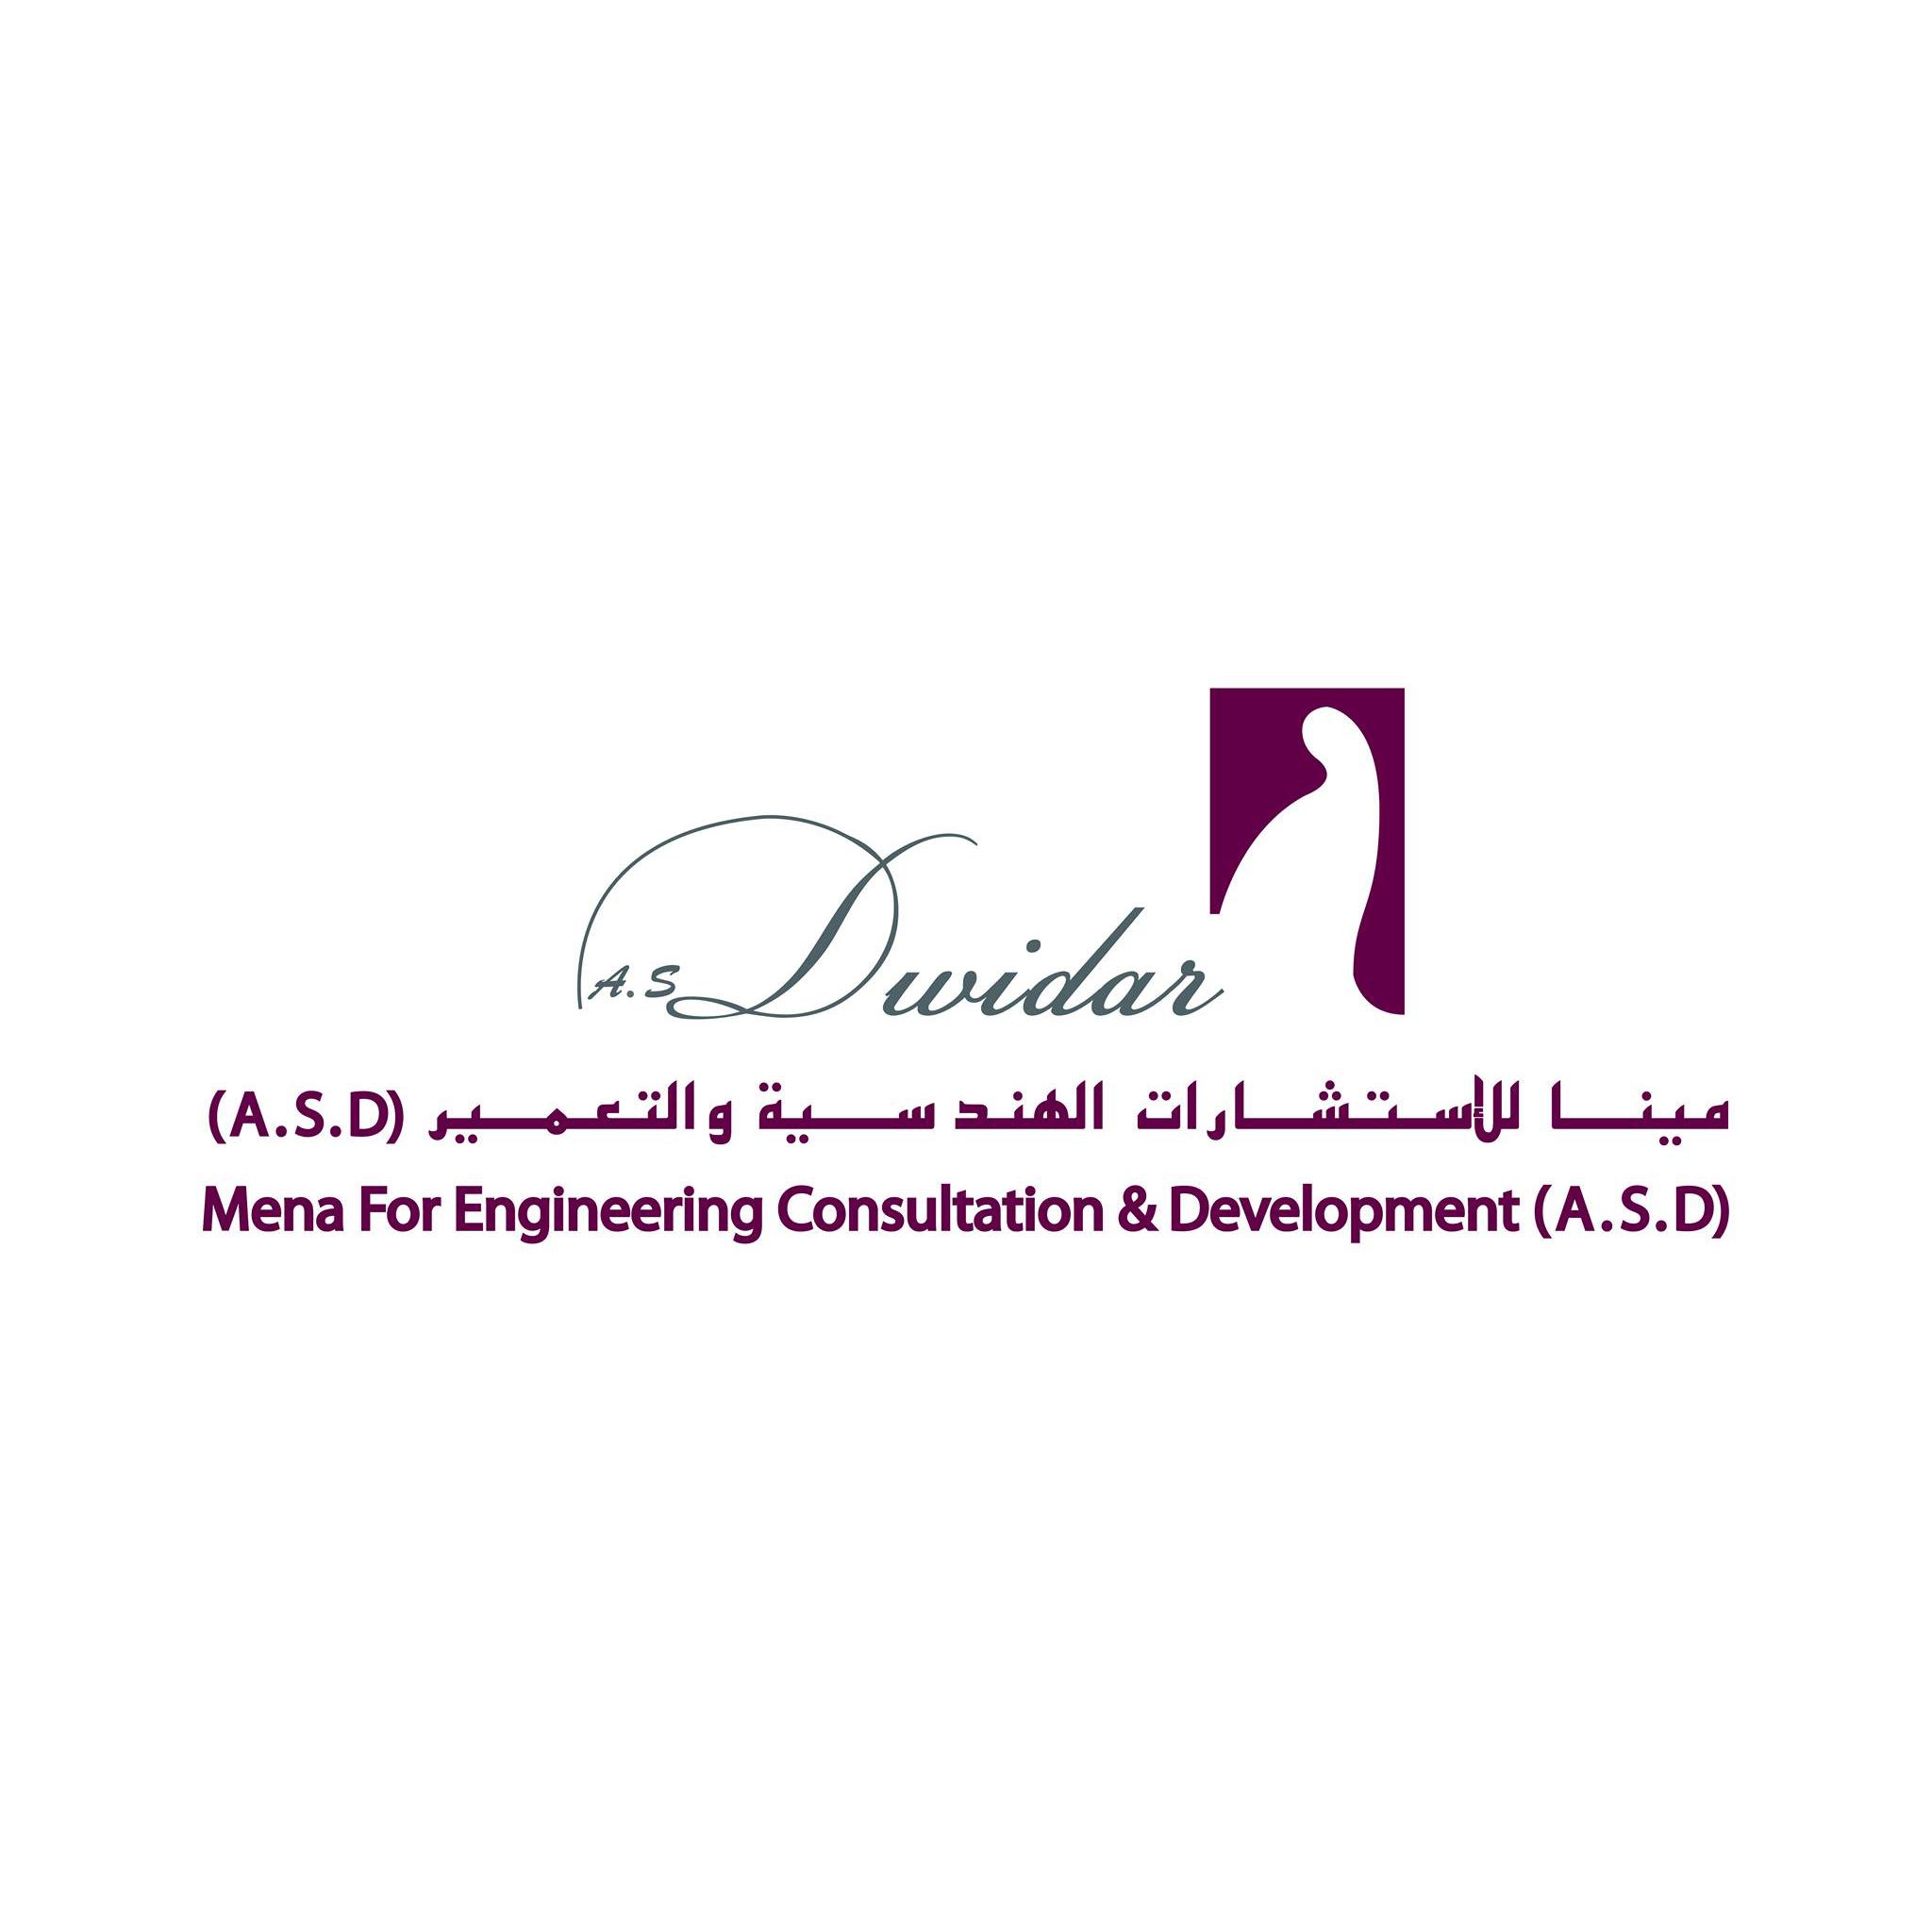 Mena For Engineering Consultation & Development